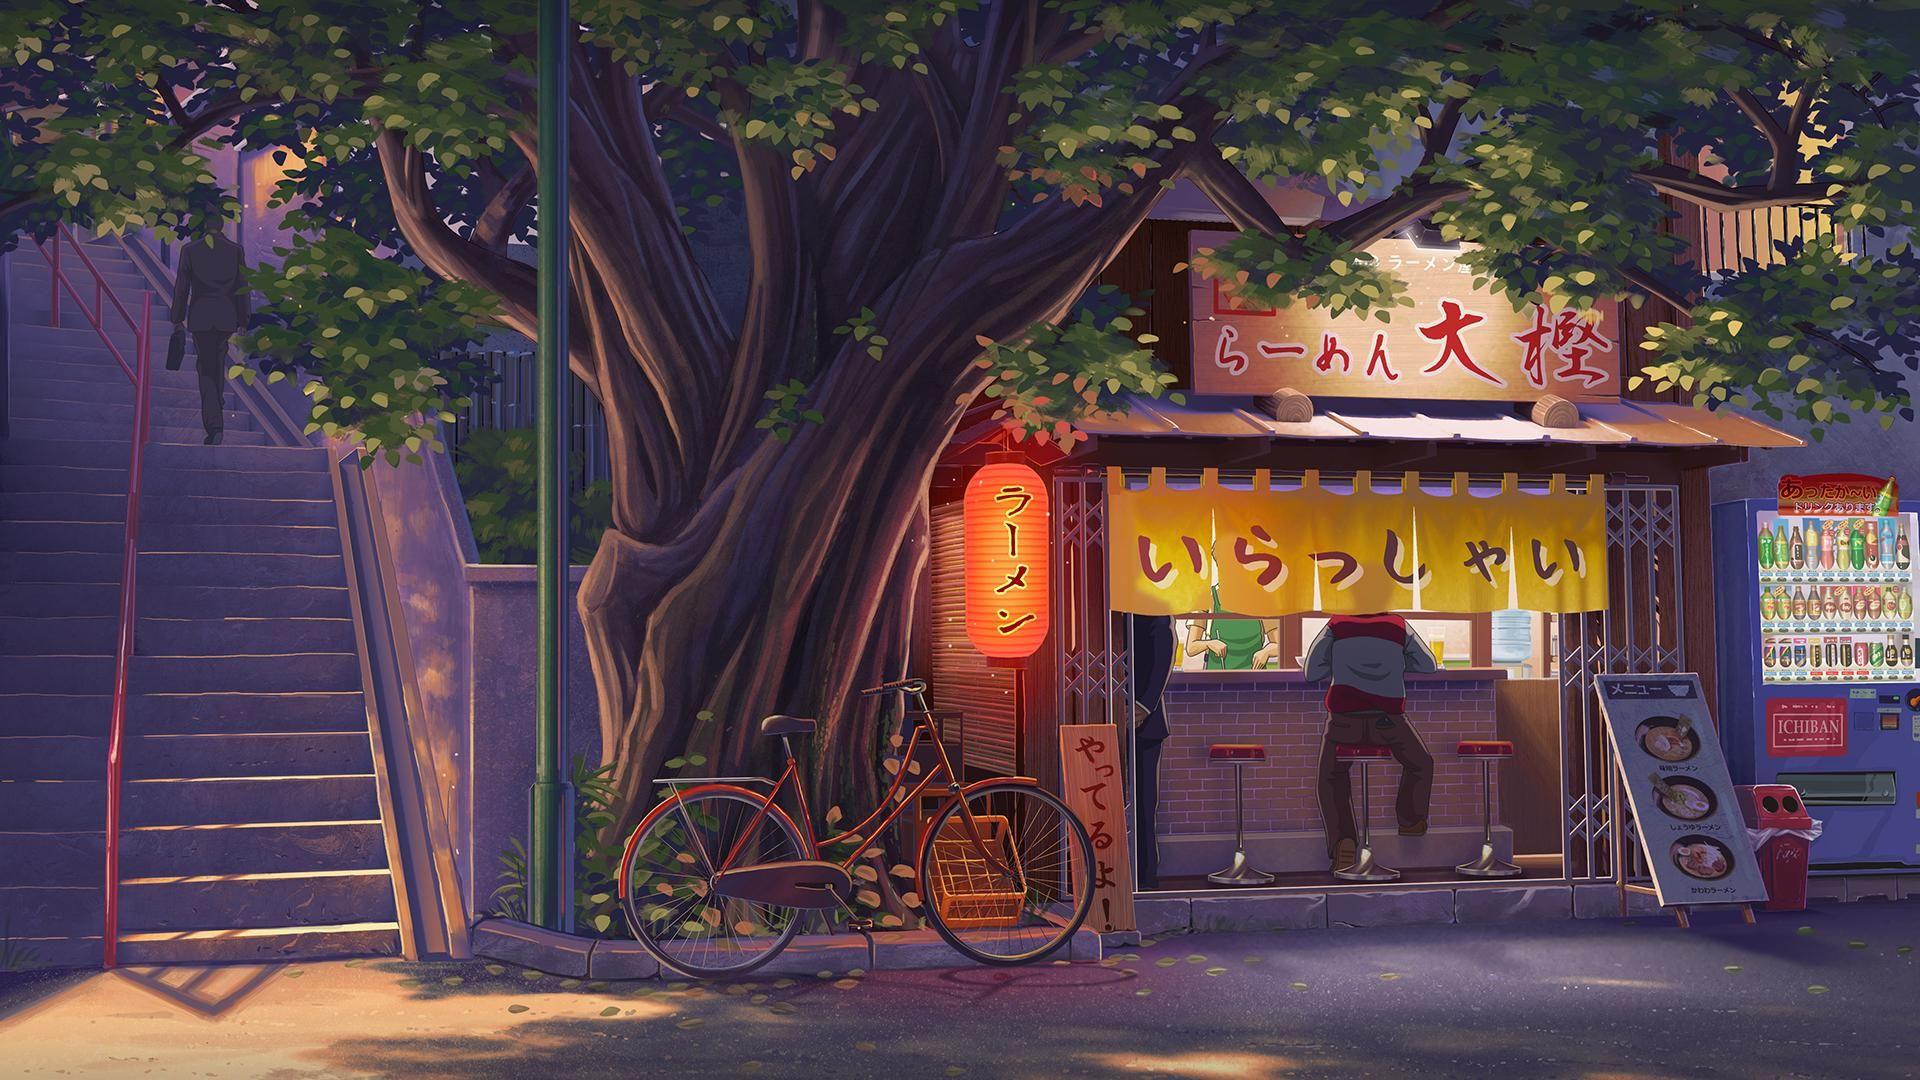 Pin By Gabby Gutierrez On Art 3 Aesthetic Desktop Wallpaper Anime Scenery Wallpaper Scenery Wallpaper